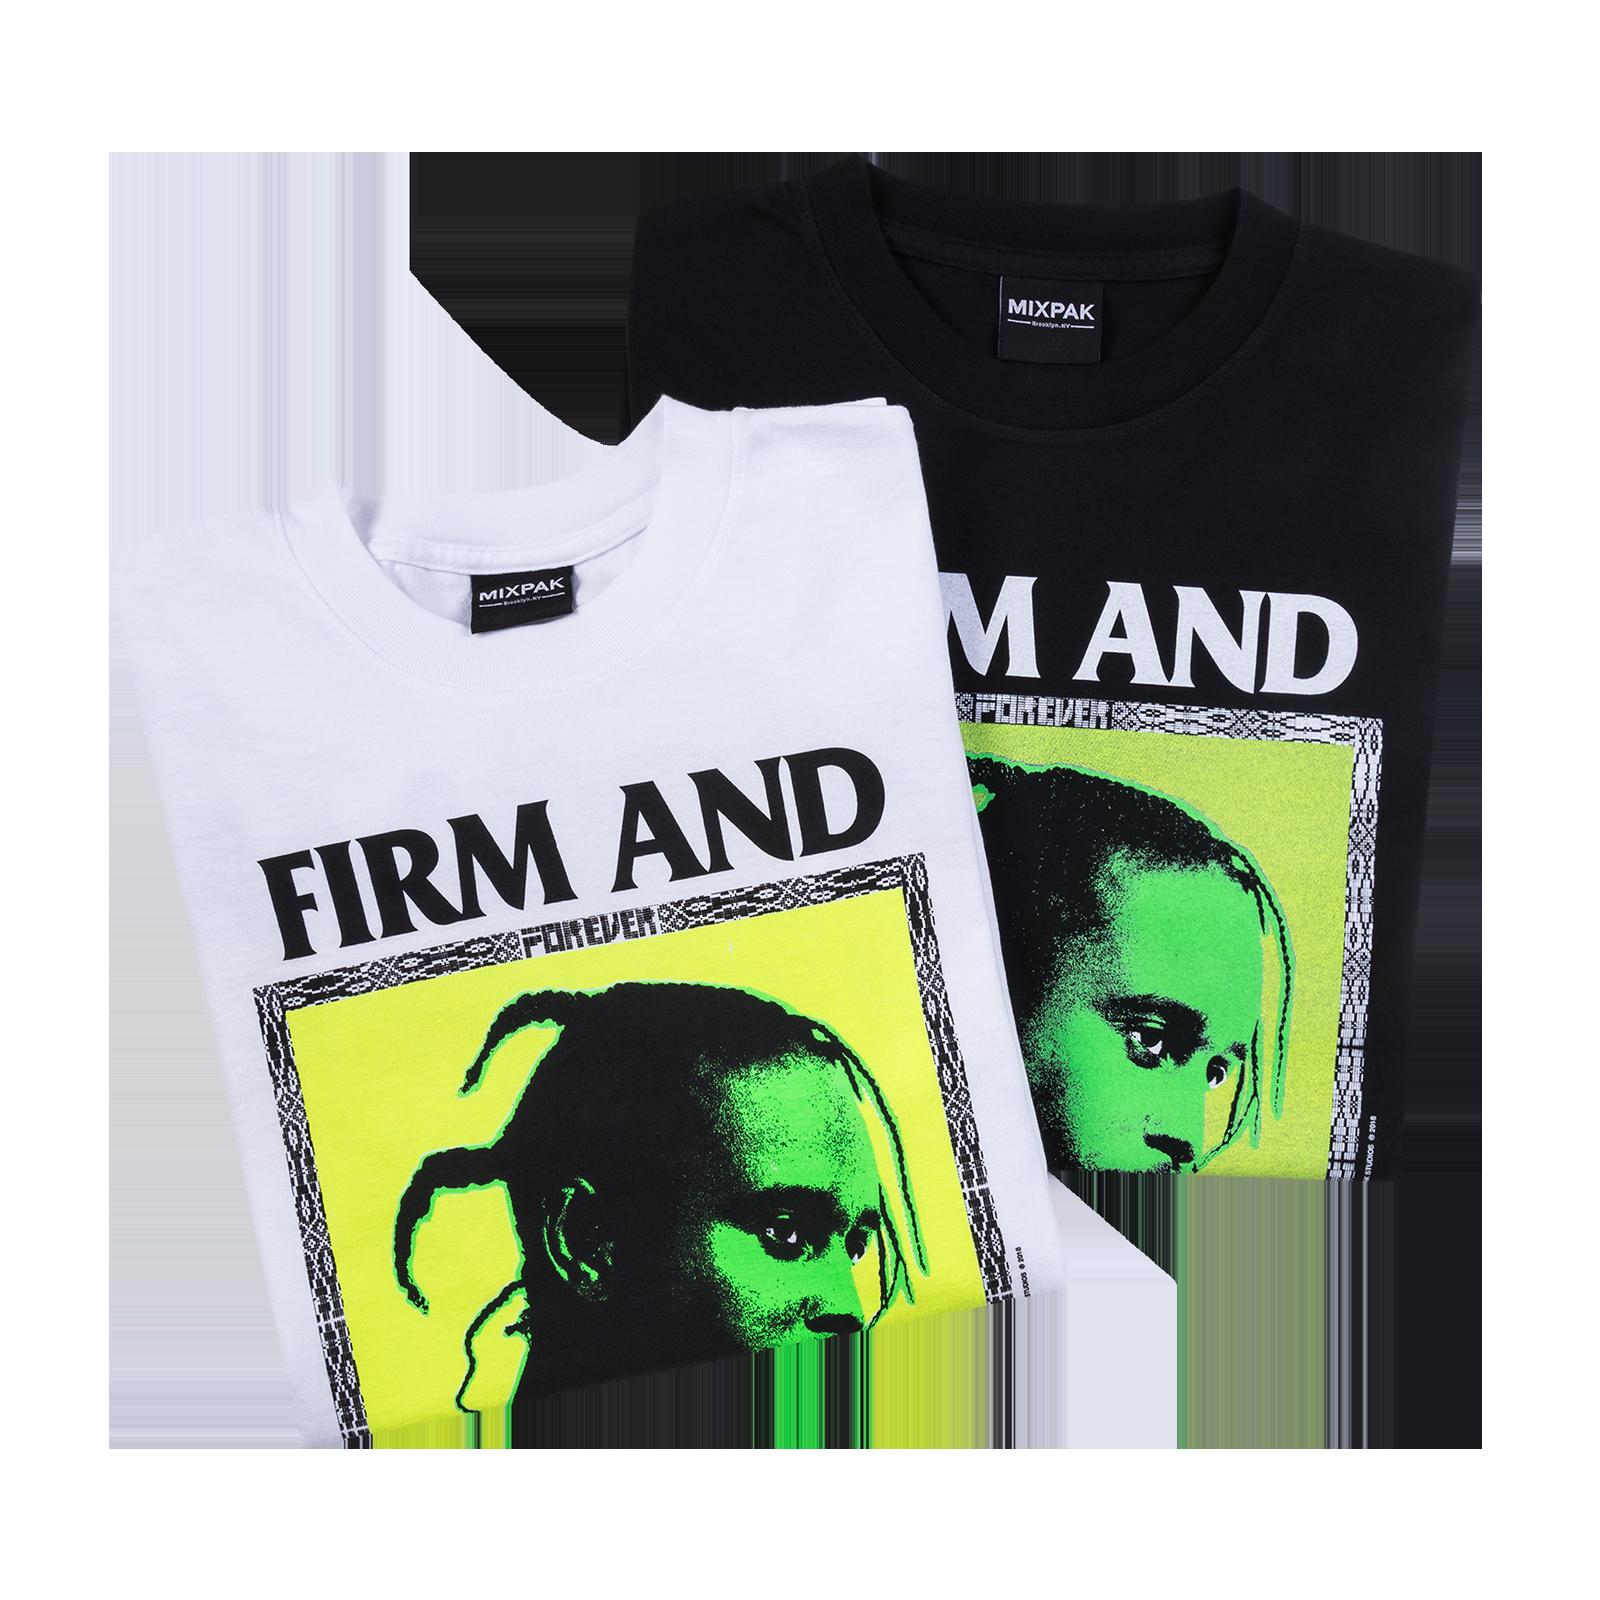 T-shirts product photo